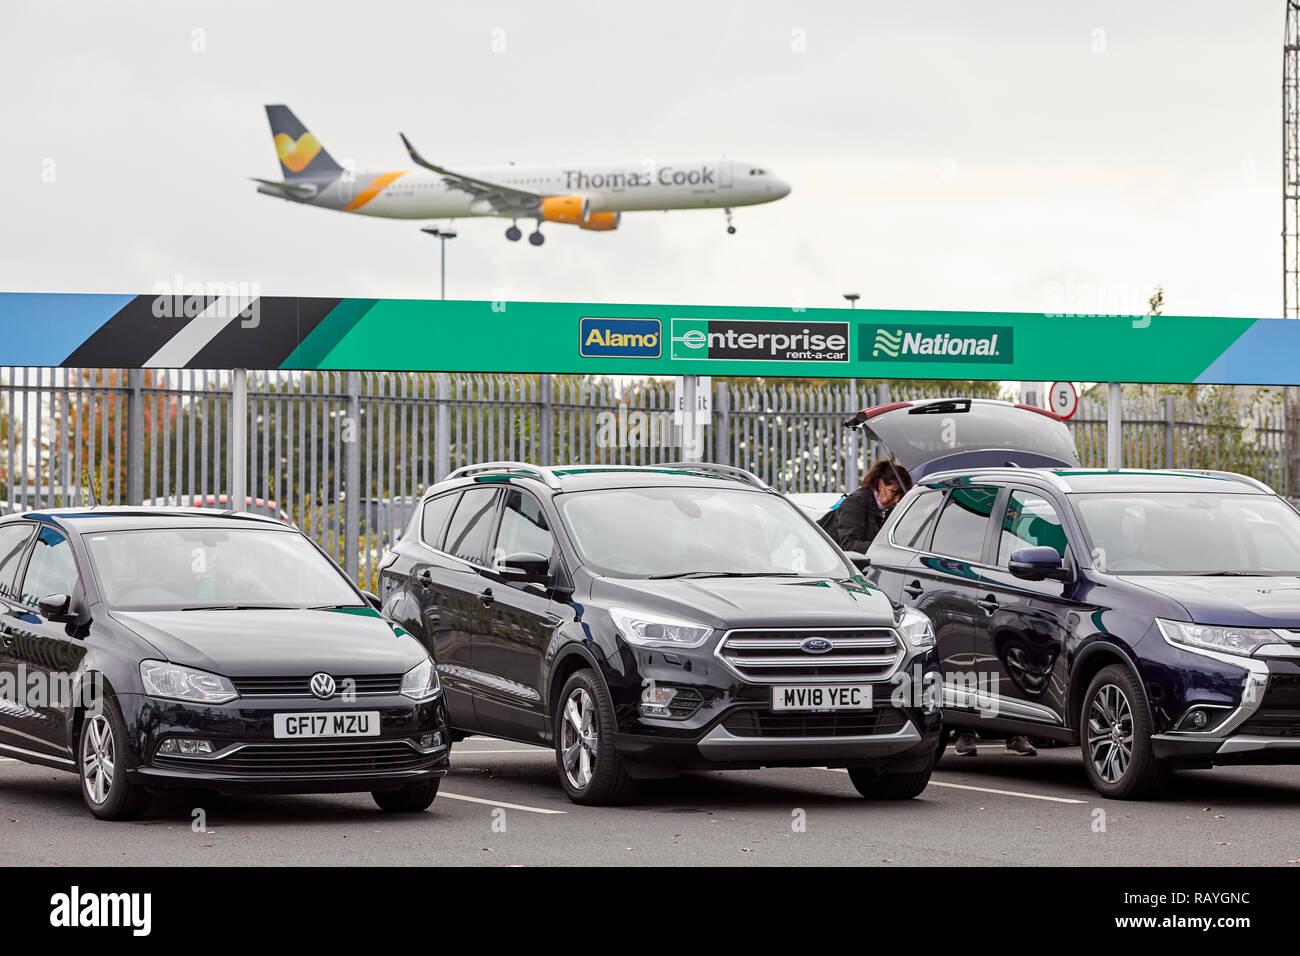 Empresa de alquiler de coches Alamo, Enterprise, National Car Rental Village en el aeropuerto de Manchester Foto de stock